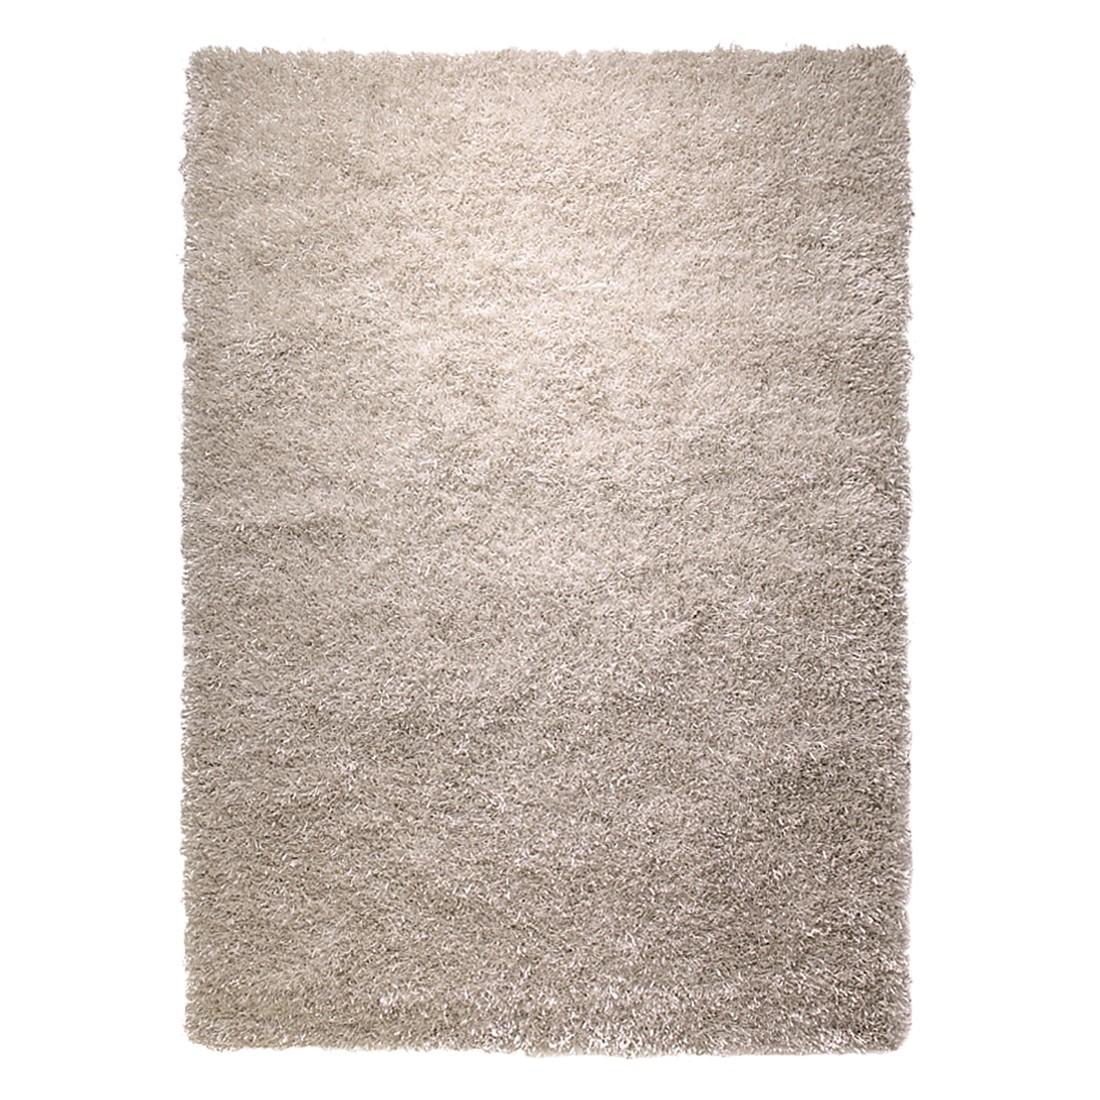 Teppich ESPRIT Cool Glamour - Chrystal - 70 x 140 cm, Esprit Home